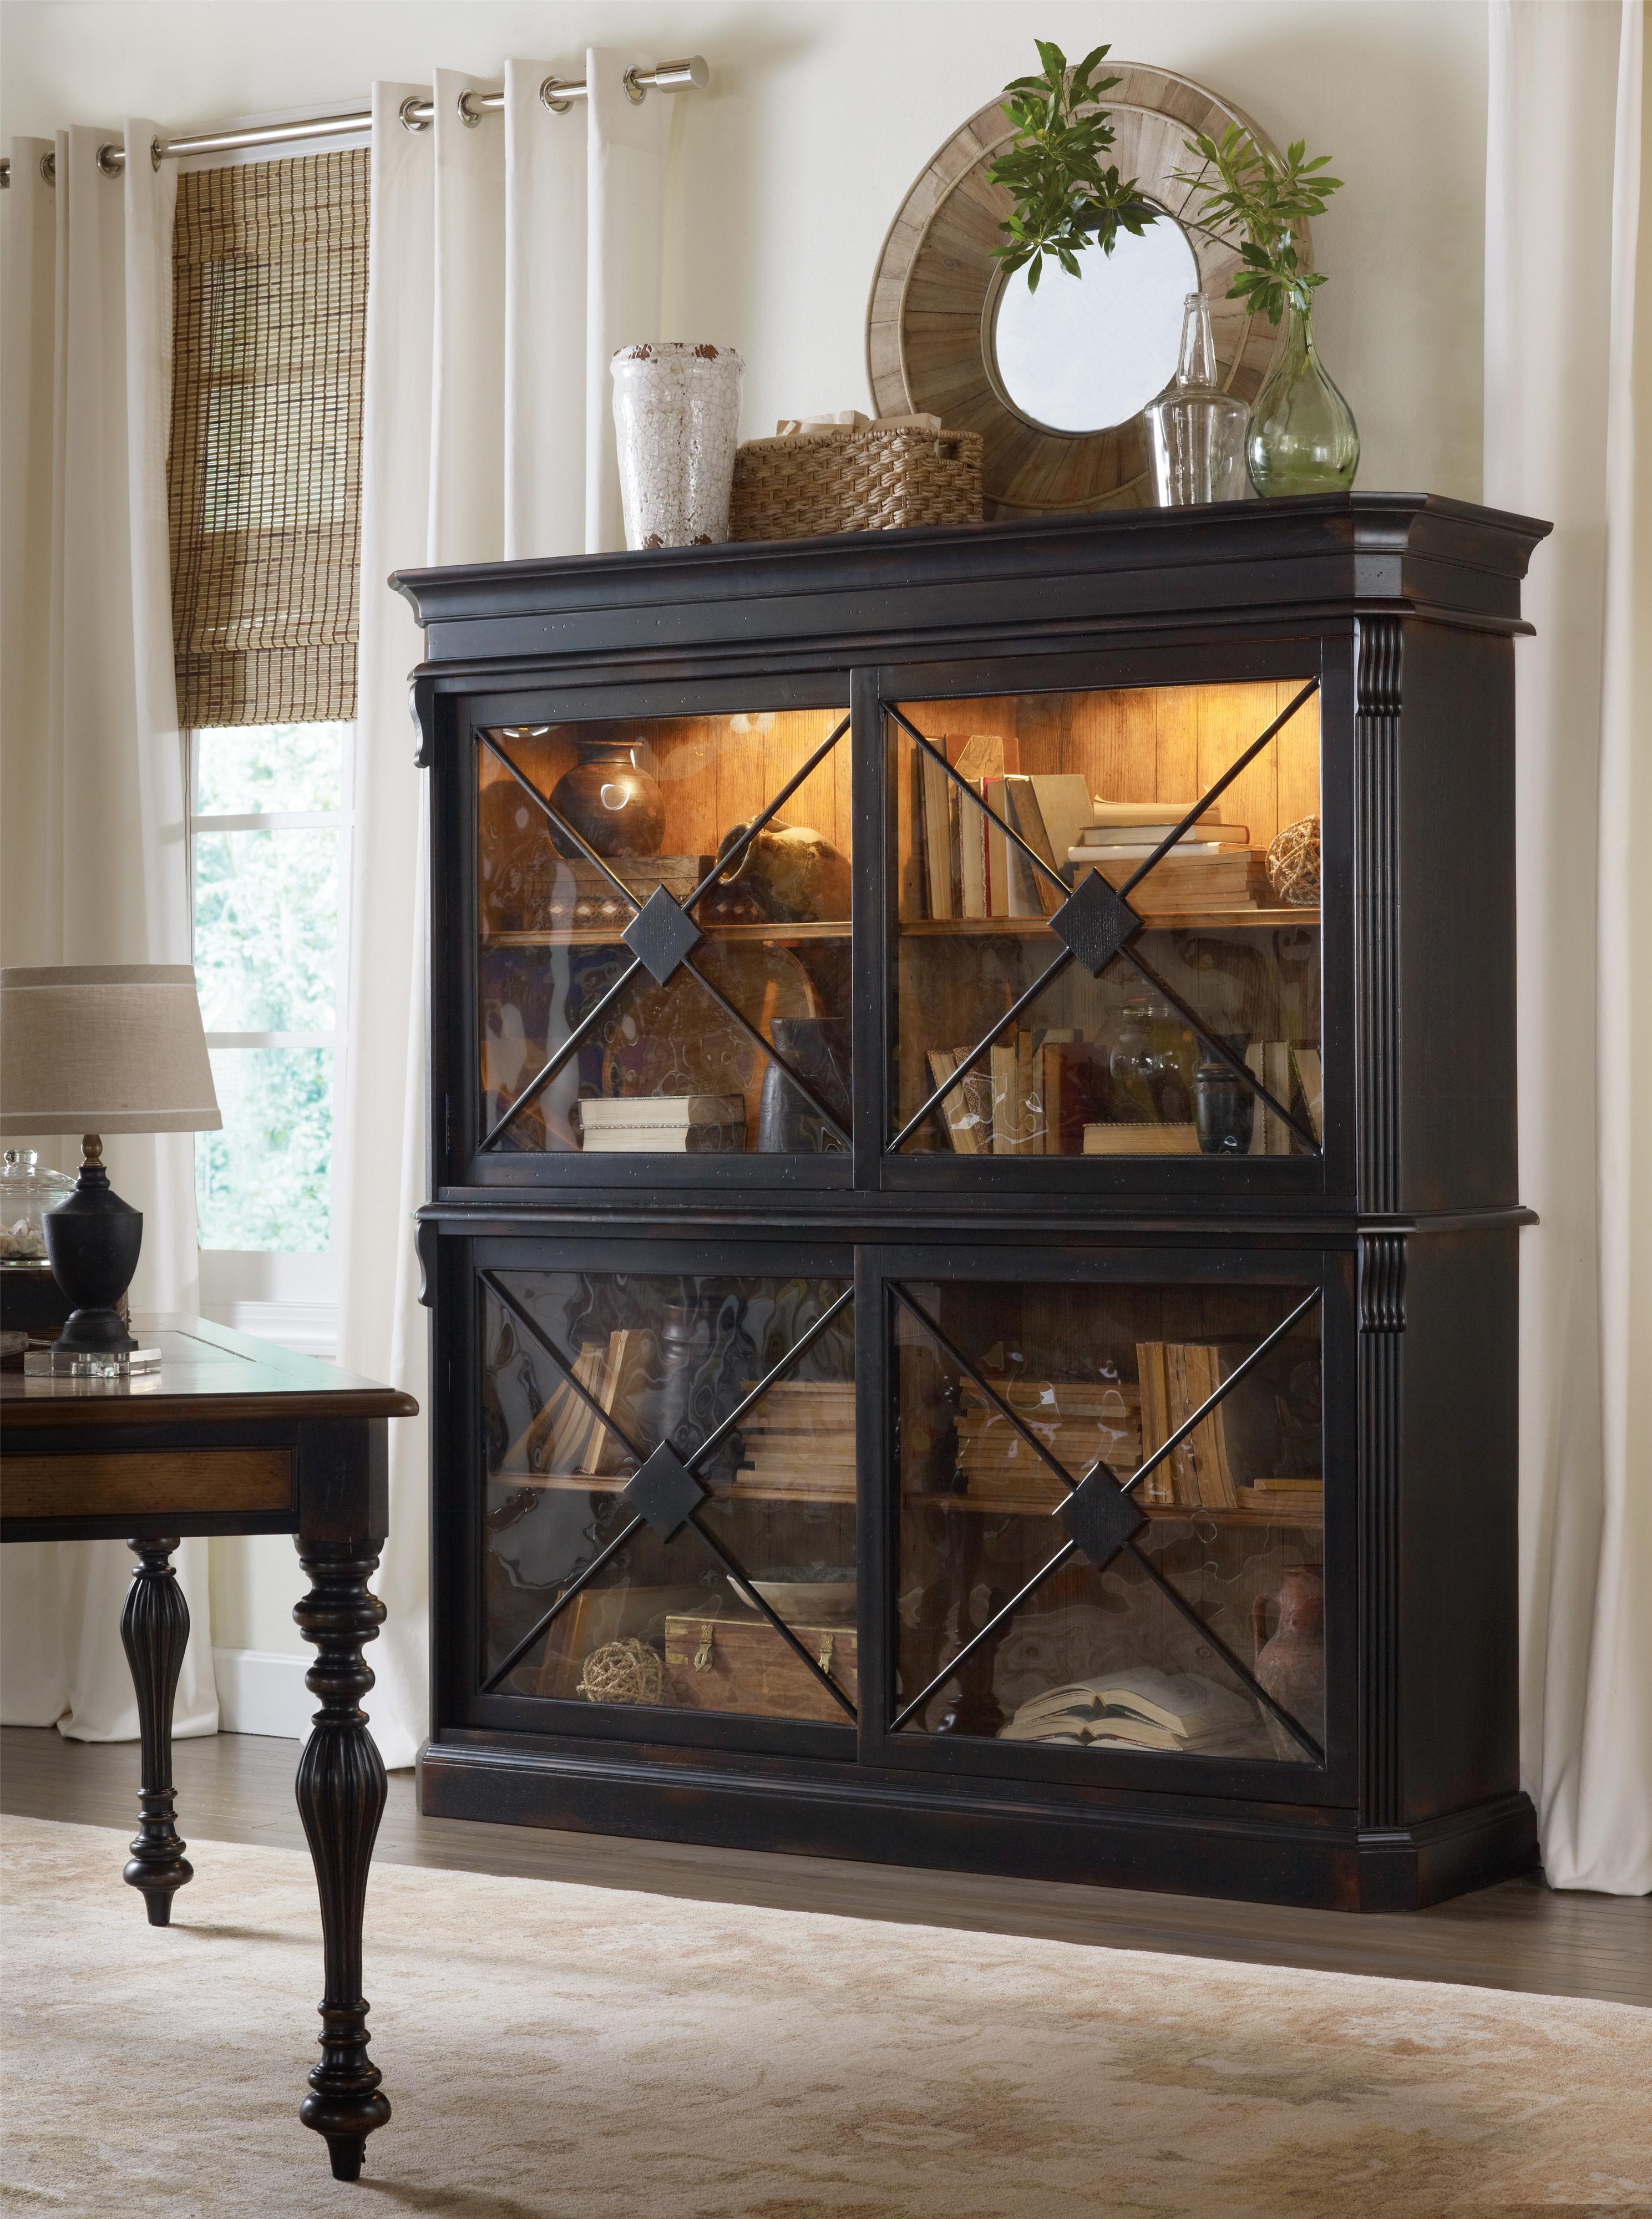 Superb Sanctuary Ebony By Hooker Furniture Sam Levitz Furniture Home Interior And Landscaping Mentranervesignezvosmurscom